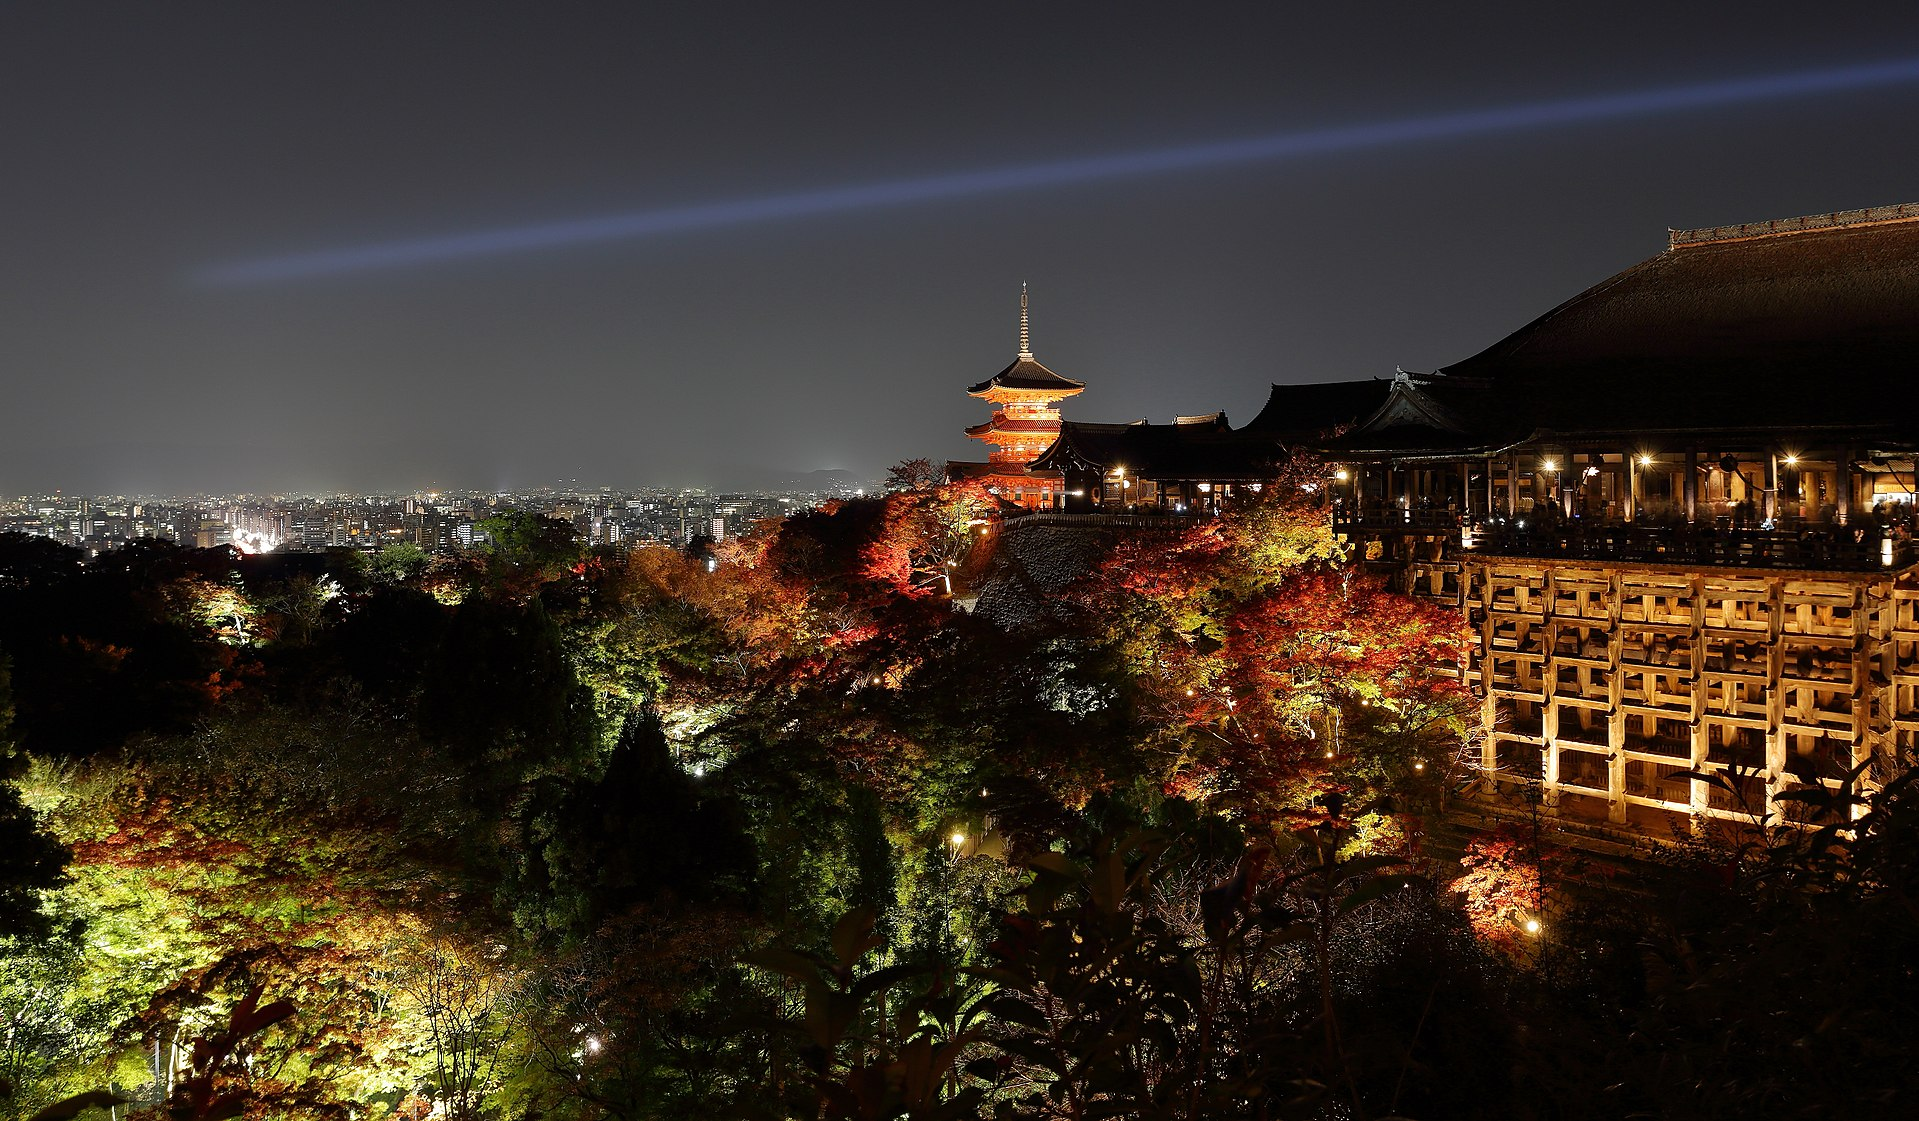 1920px-Kiyomizu-dera,_Kyoto,_November_2016_-06.jpg